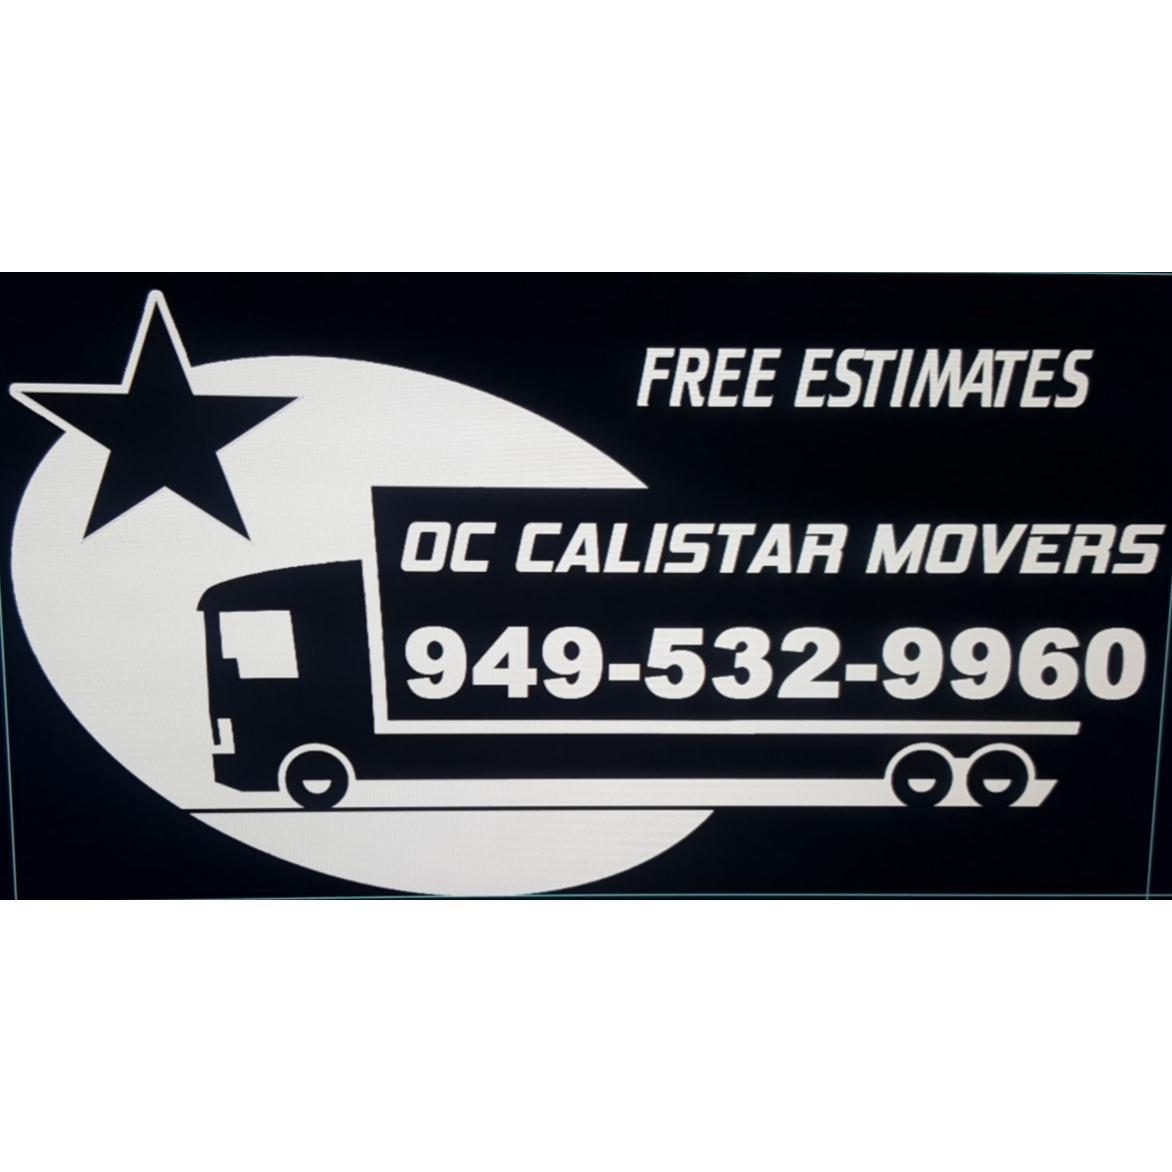 OC Cali Star Movers